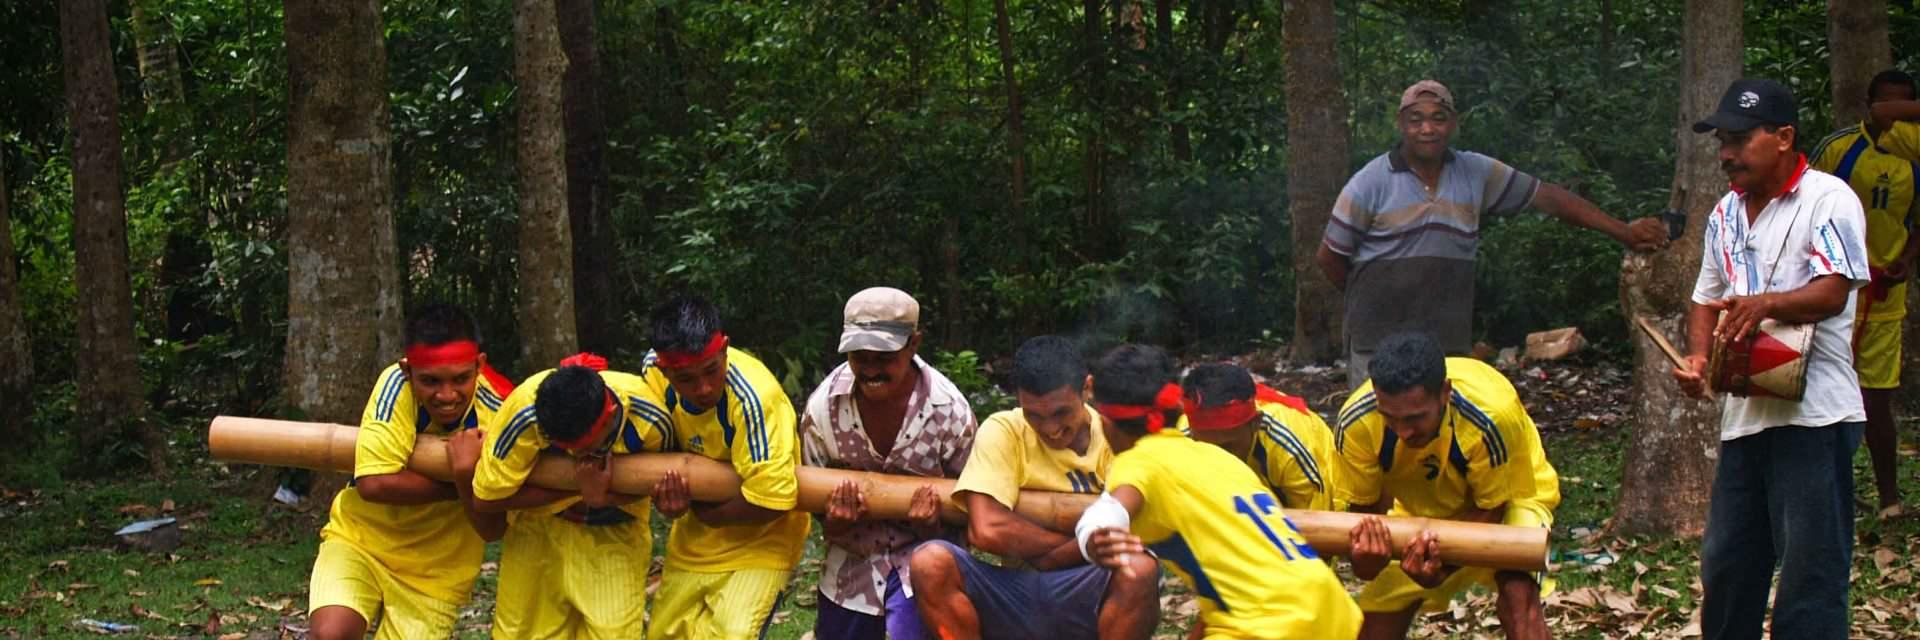 Misteri Dibalik Bambu Gila Maluku Misteri Dibalik Bambu Gila Maluku - Dolan Dolen